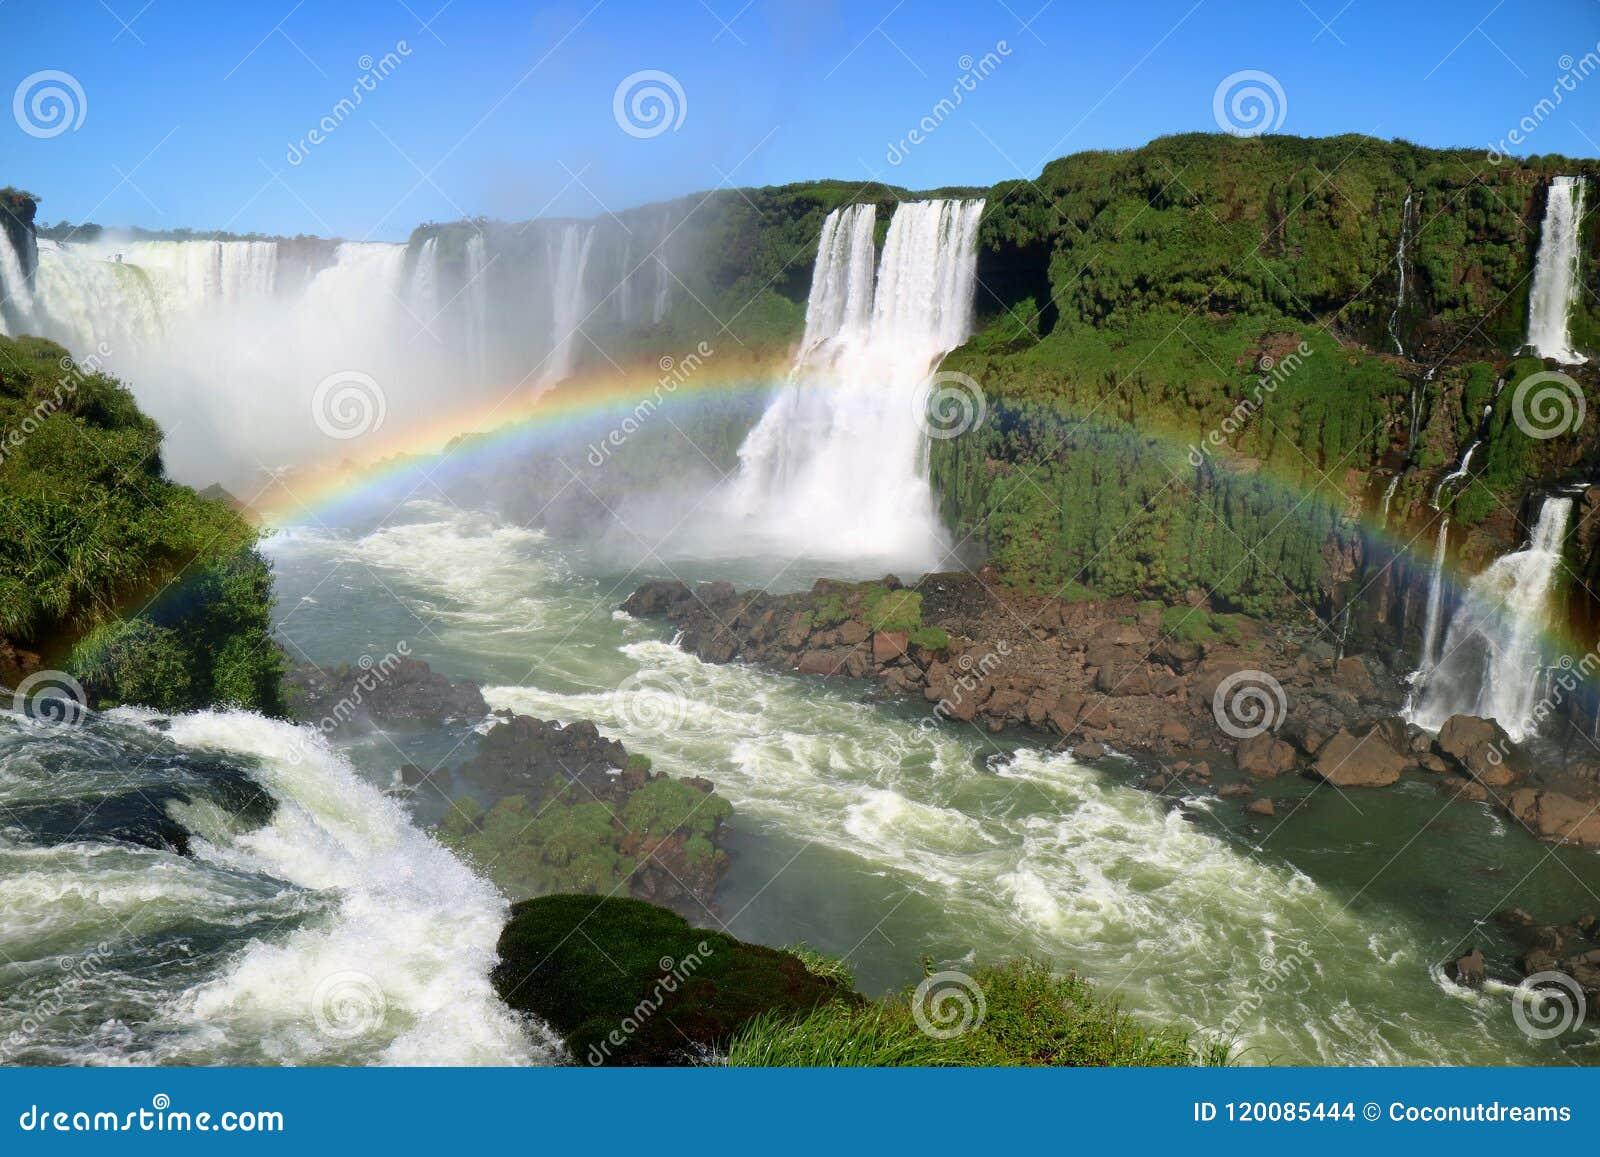 Breathtaking View Of Devils Throat Area Of Iguazu Falls Unesco